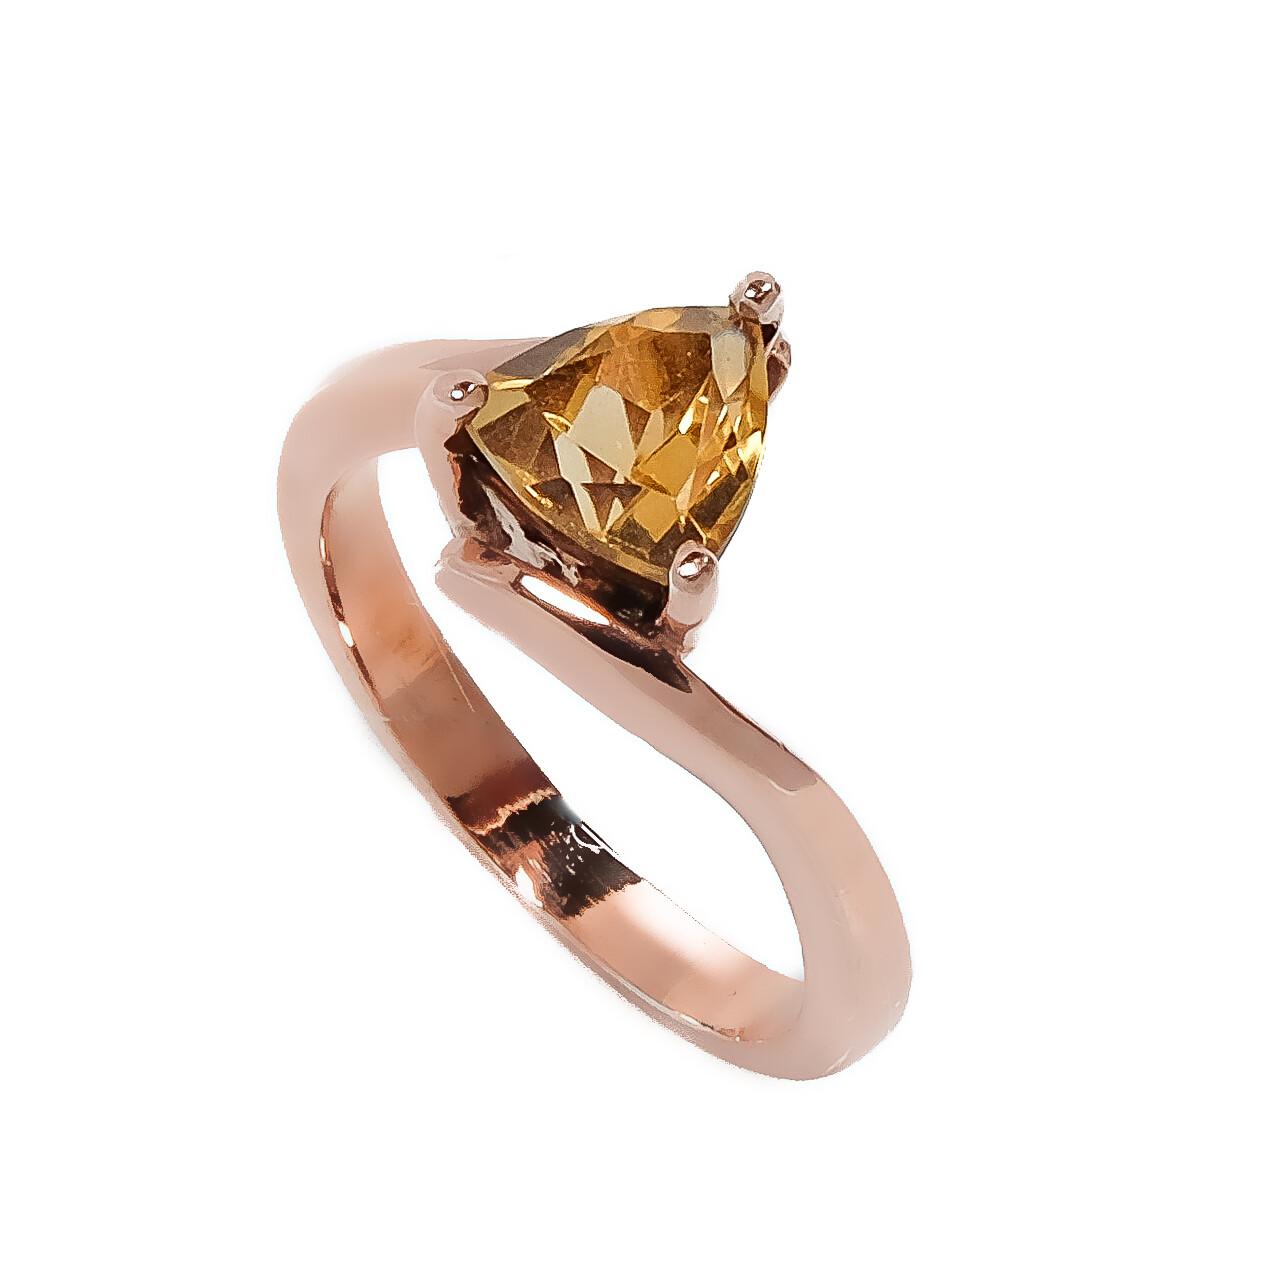 Solitaire Ring - Citrine- 6.5⌀ (Vermeil)